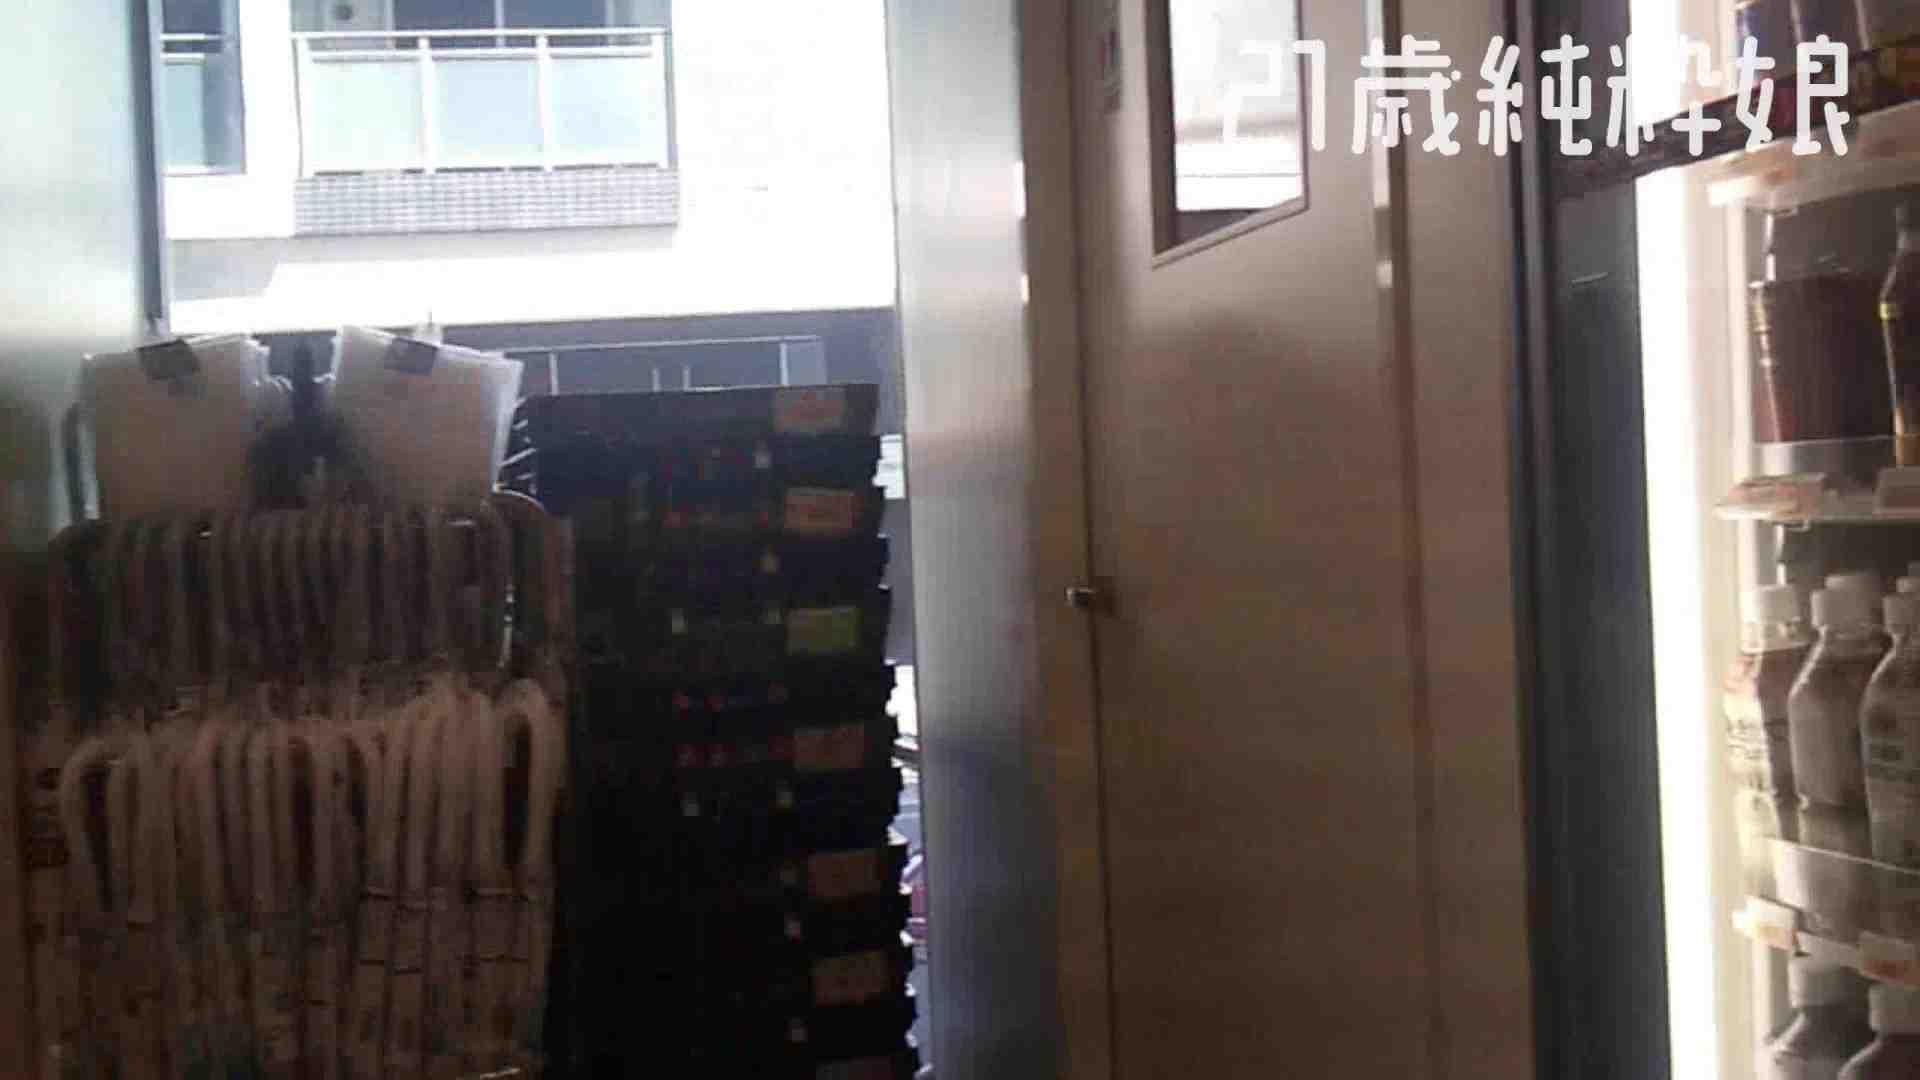 Gカップ21歳純粋嬢第2弾Vol.5 学校 オメコ動画キャプチャ 77pic 77